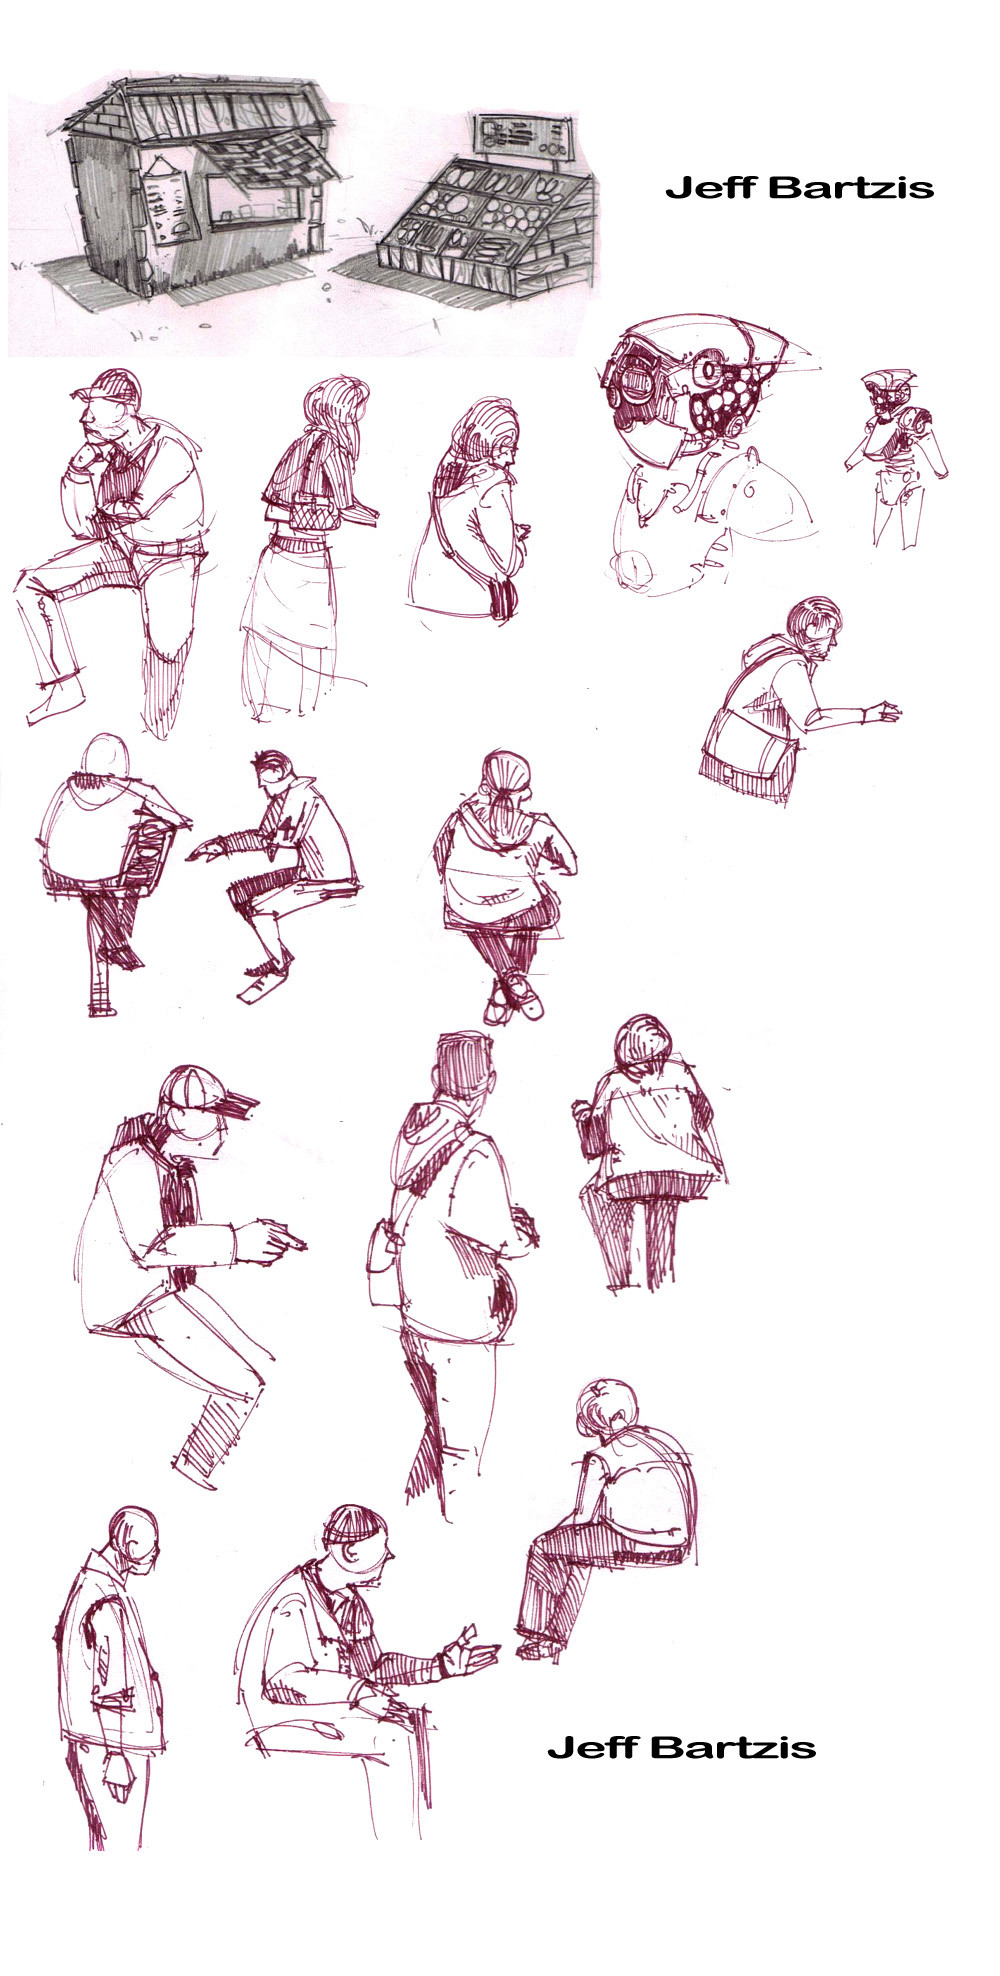 Jeff bartzis sketchbook stuff 012